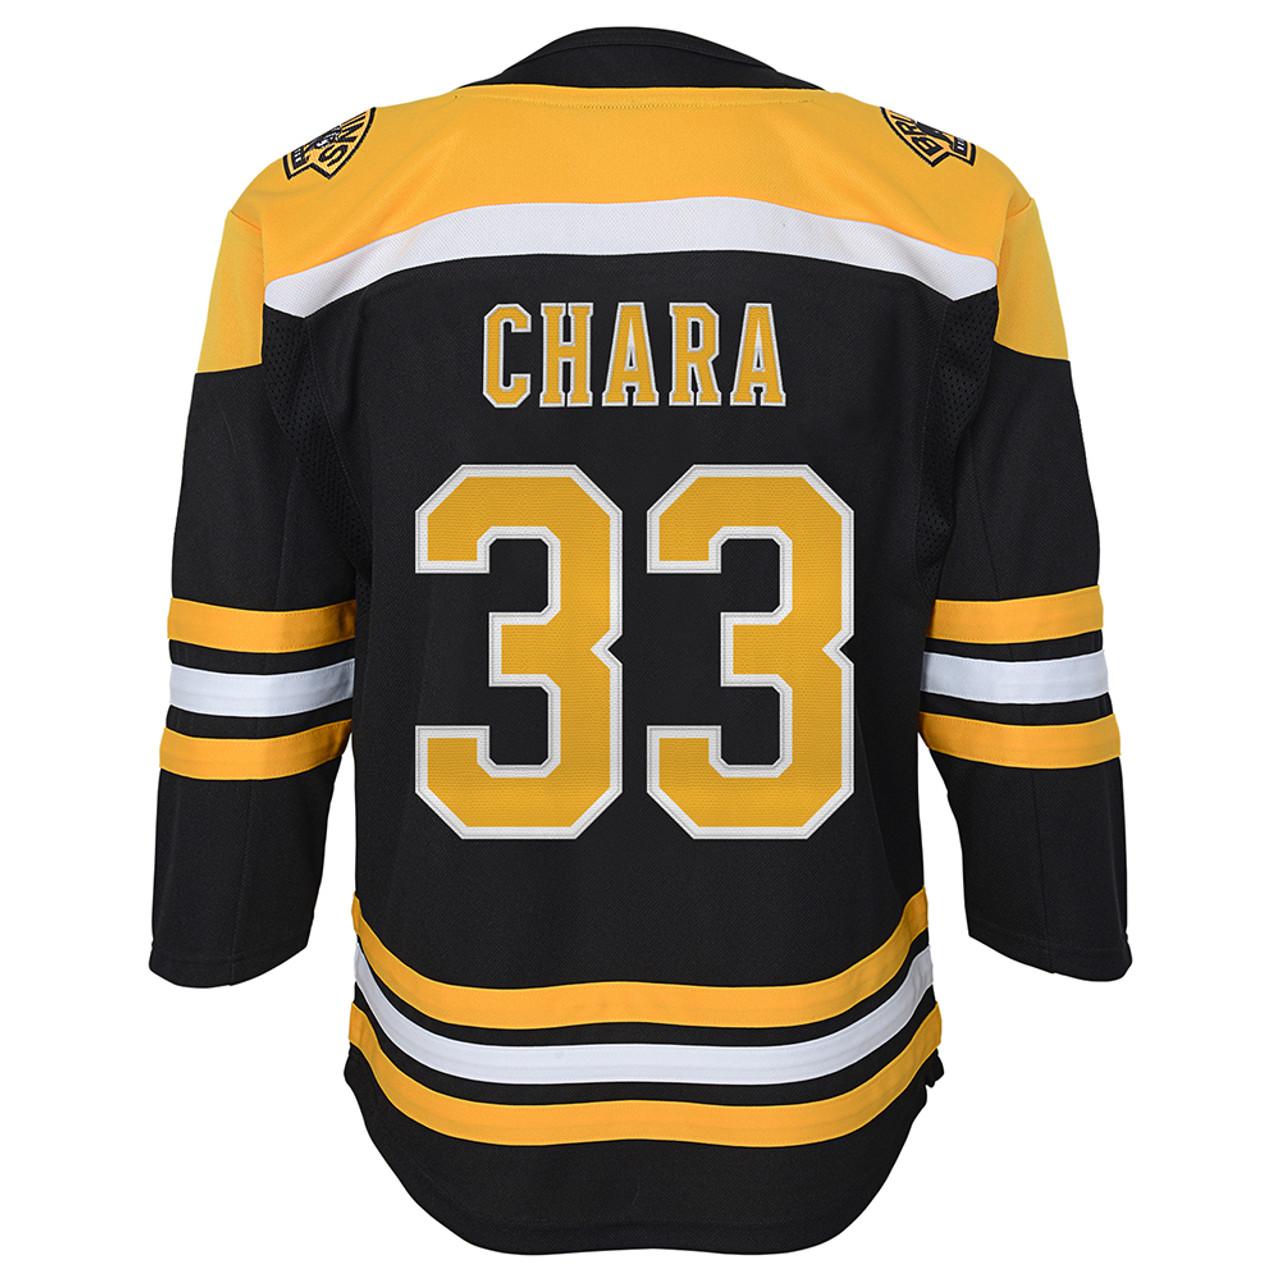 chara youth jersey